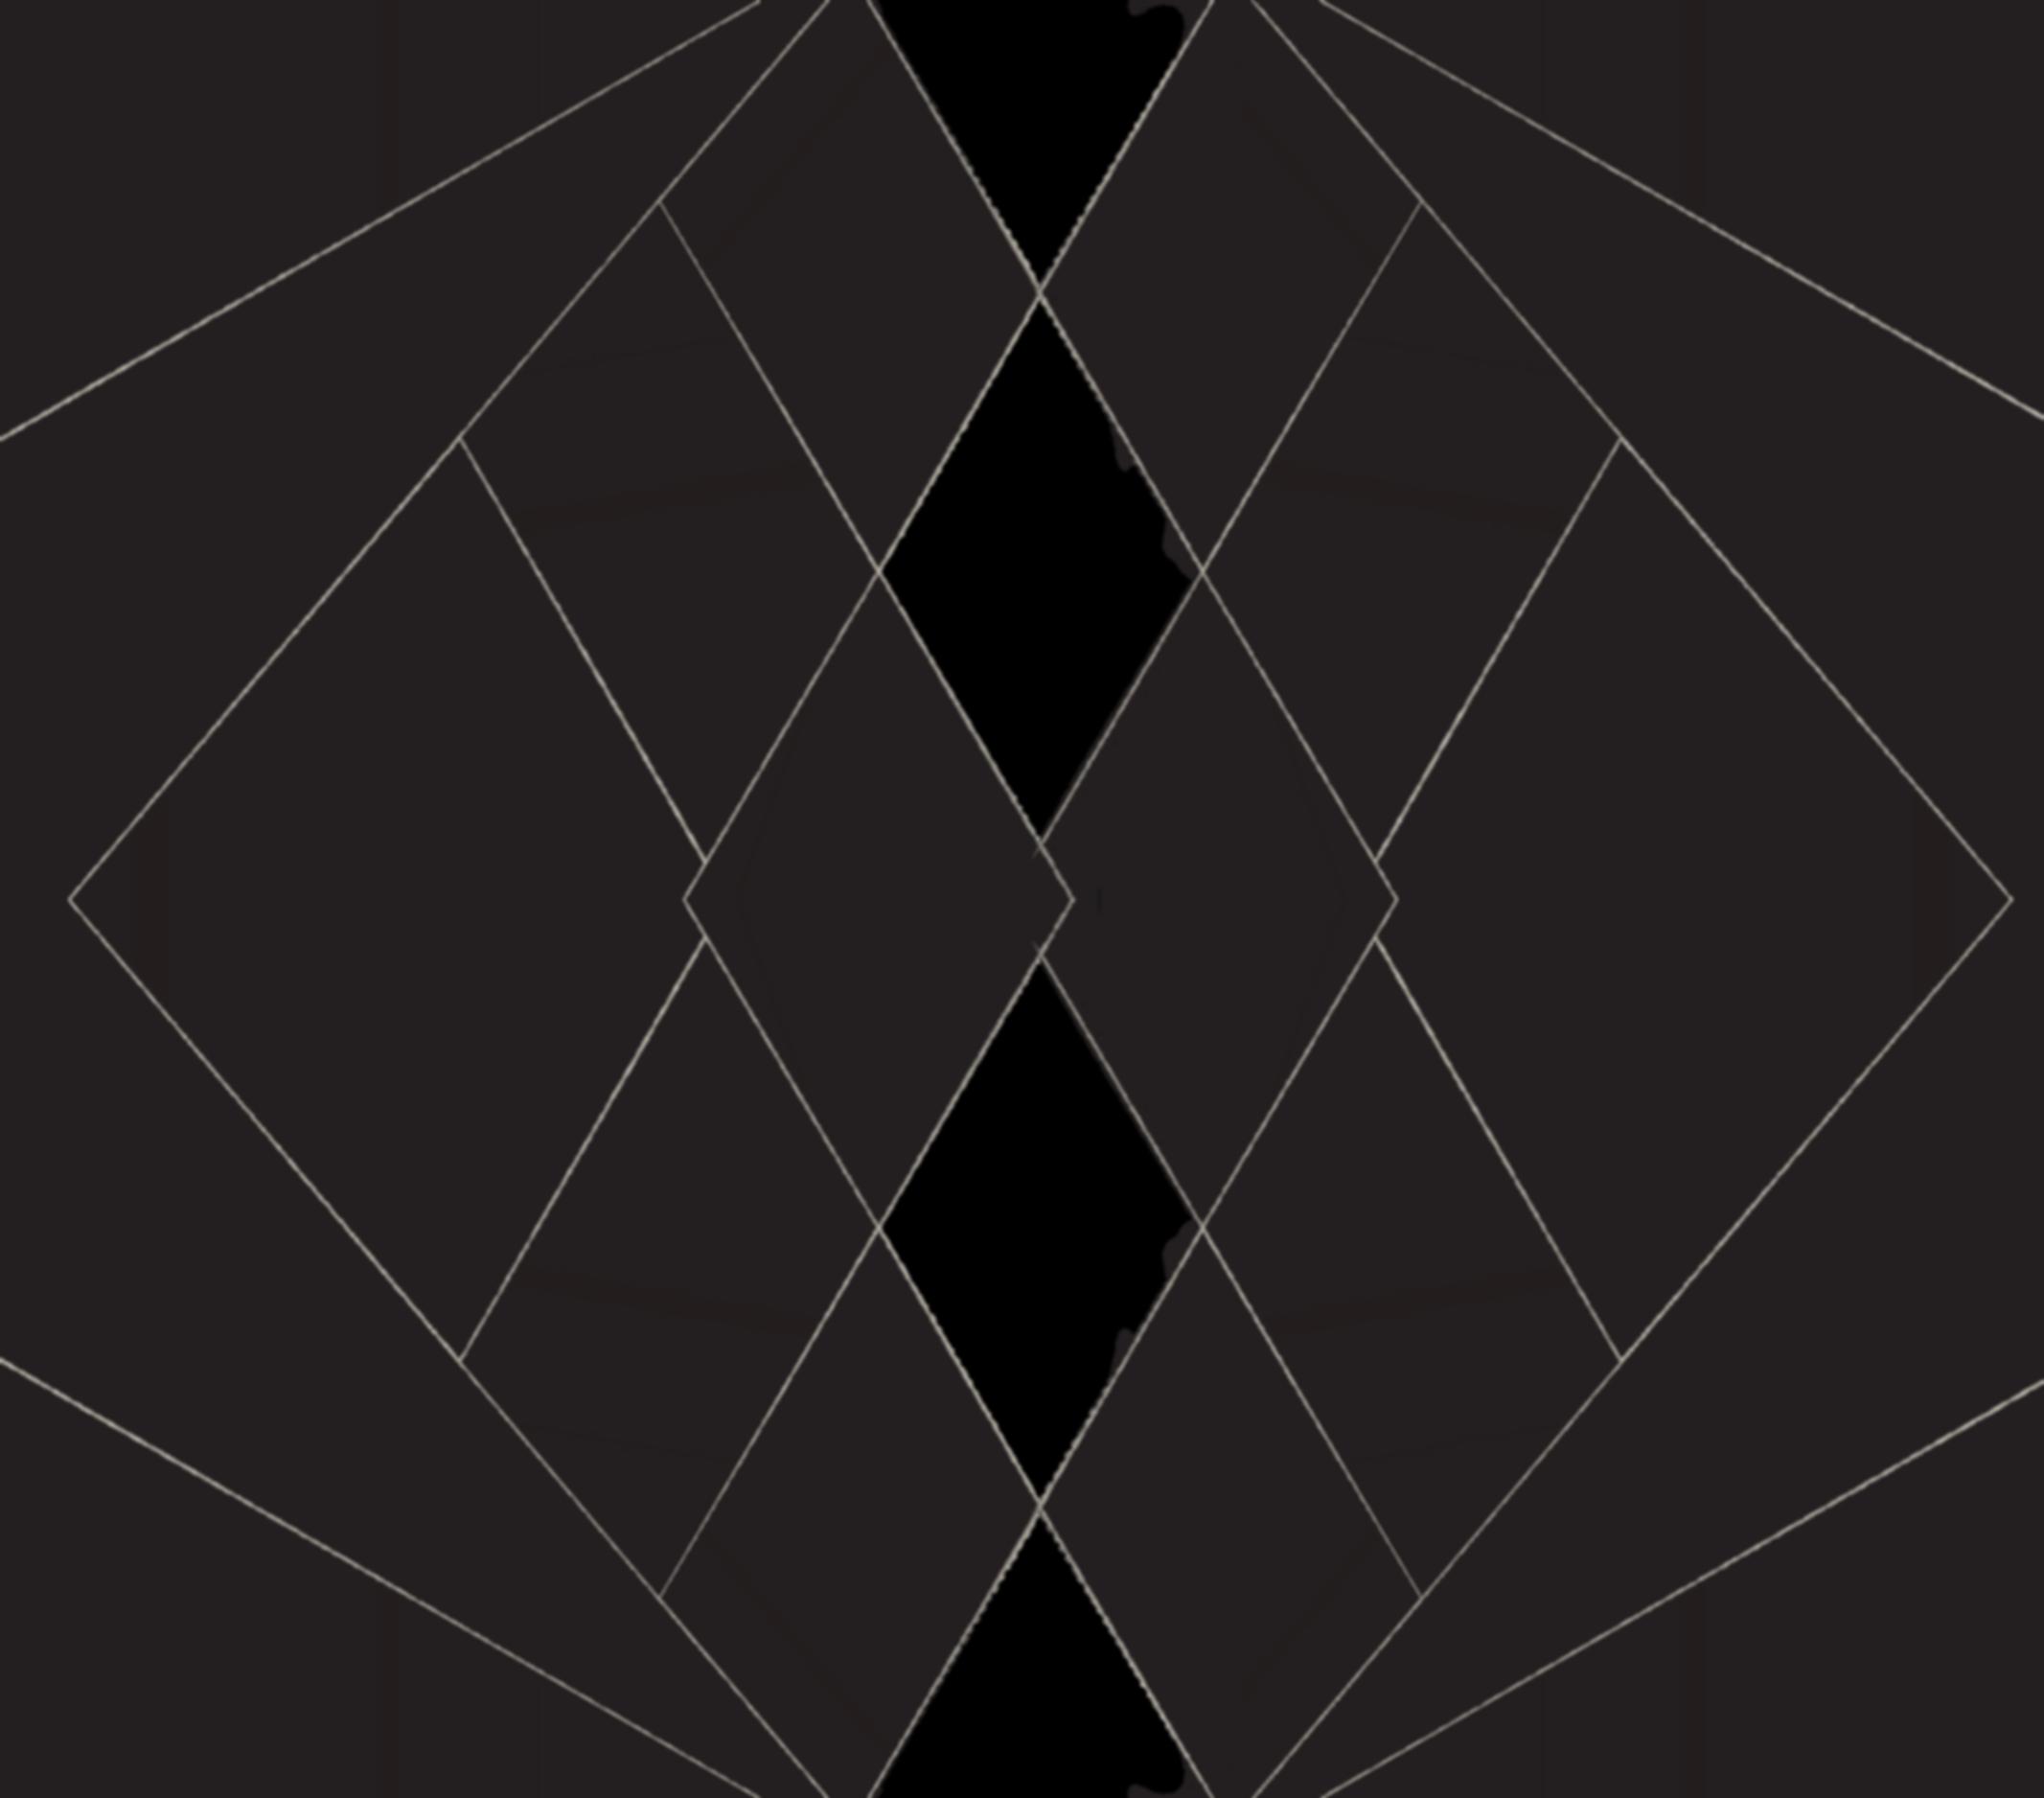 Background_Pattern-trans copy.png